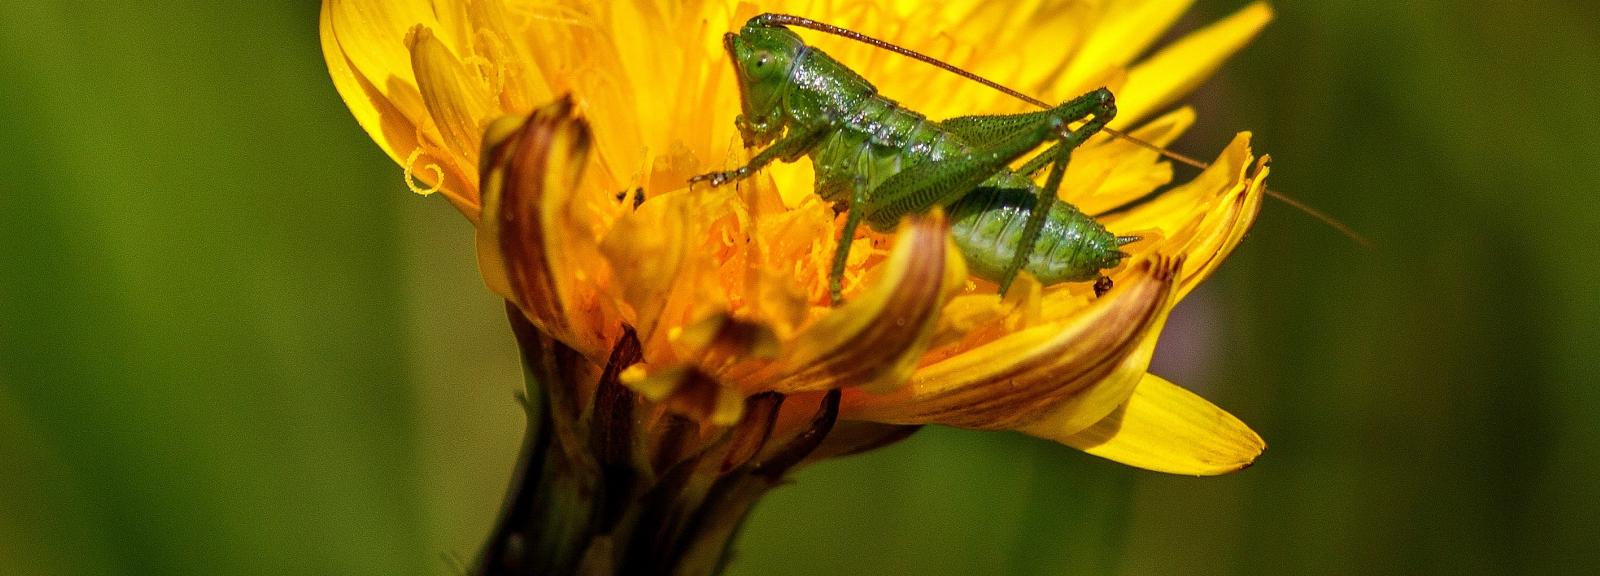 Nymphe Grande sauterelle verte © maxime raynal (flickr)